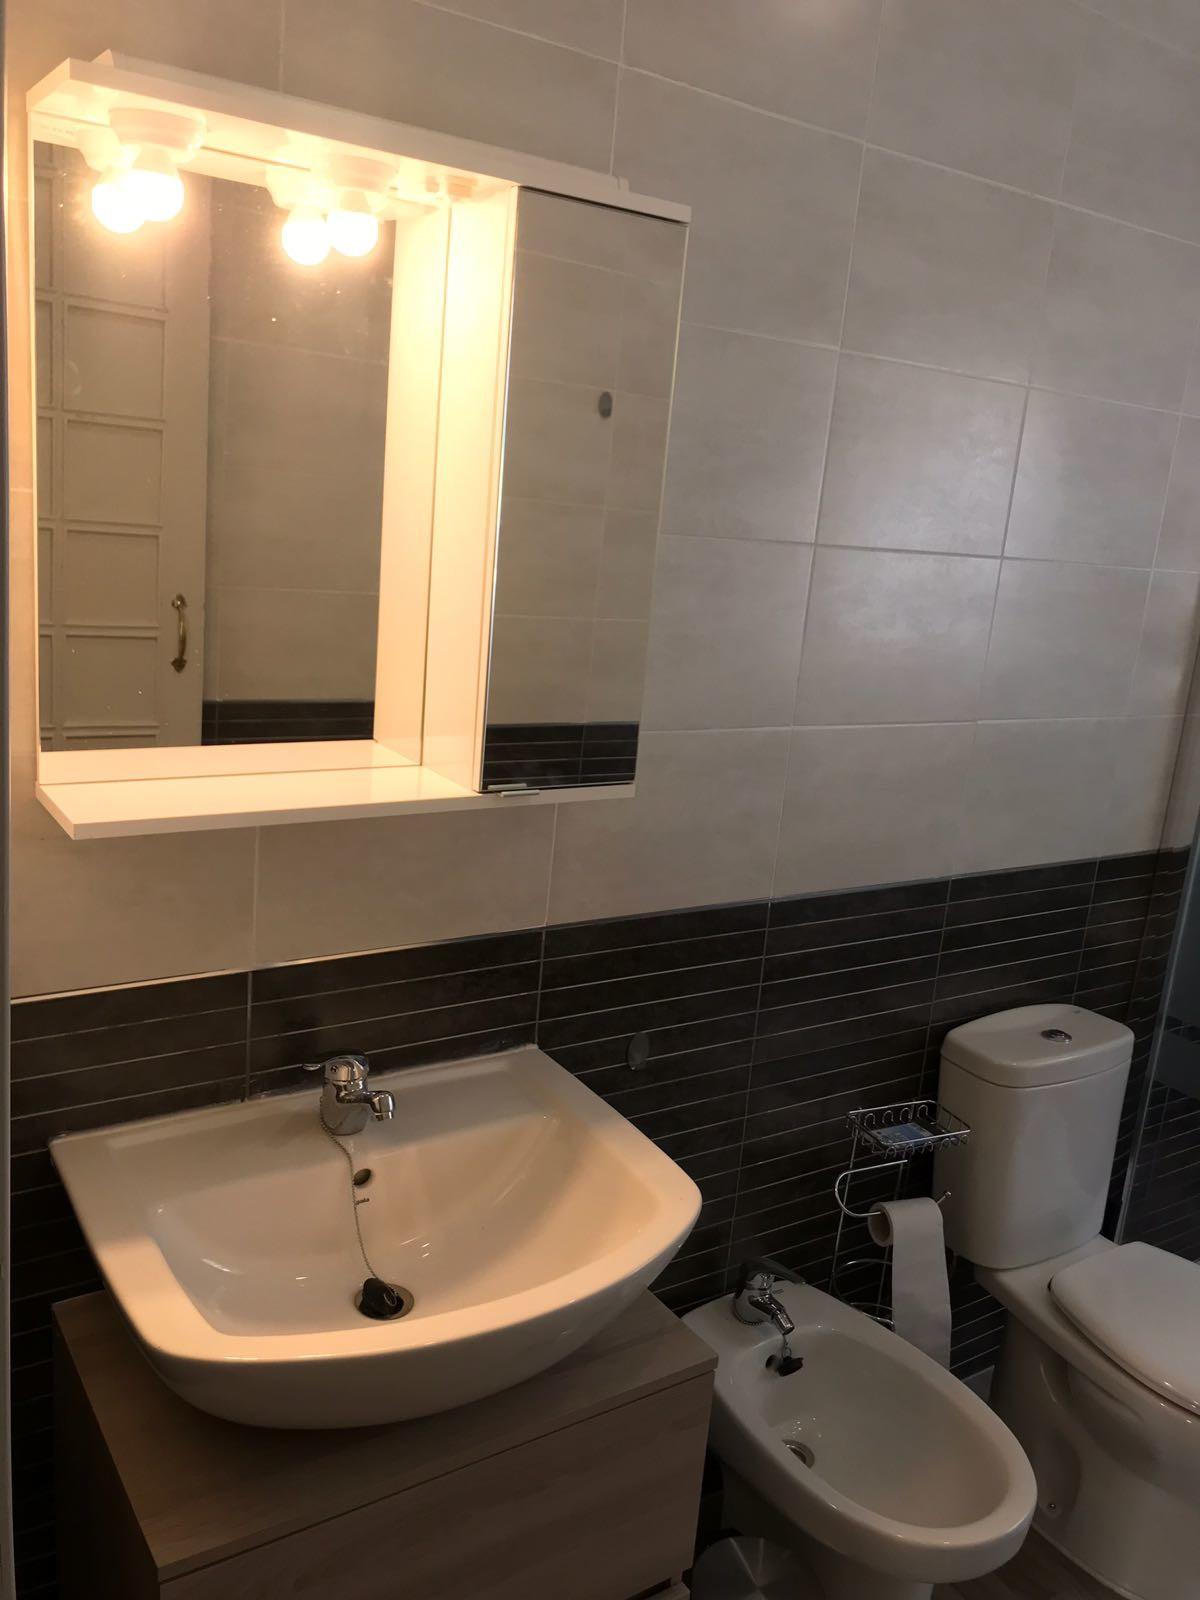 habitacion-piso-recien-reformado-totalmente-centro-gobierno-civil-9d654af84def625d1b1618c06f28d460